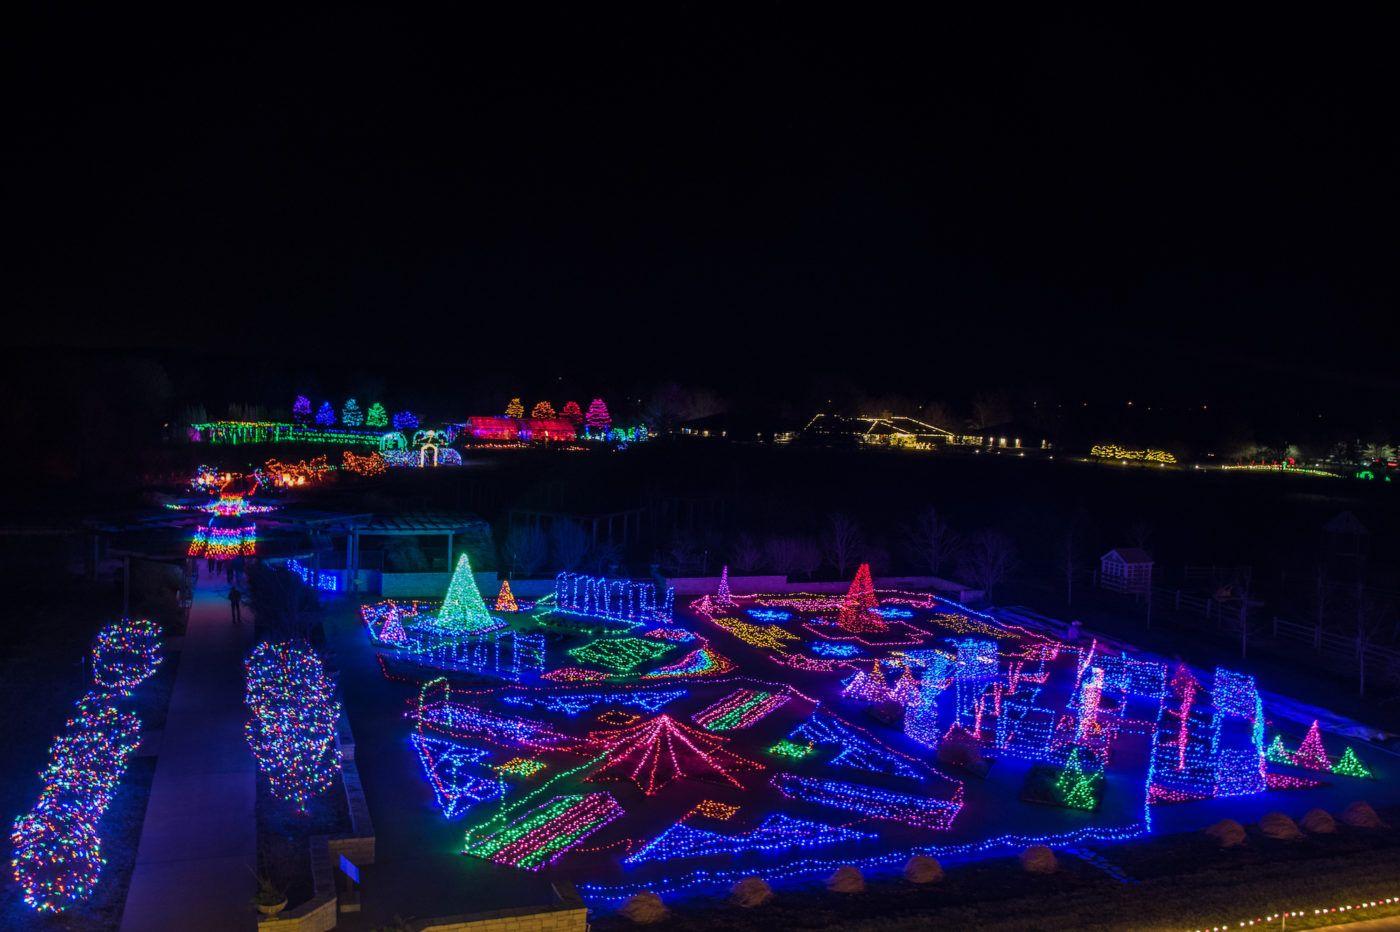 54c0bb662da593012ce7246a3d186ab8 - Festival Of Lights Moody Gardens December 11